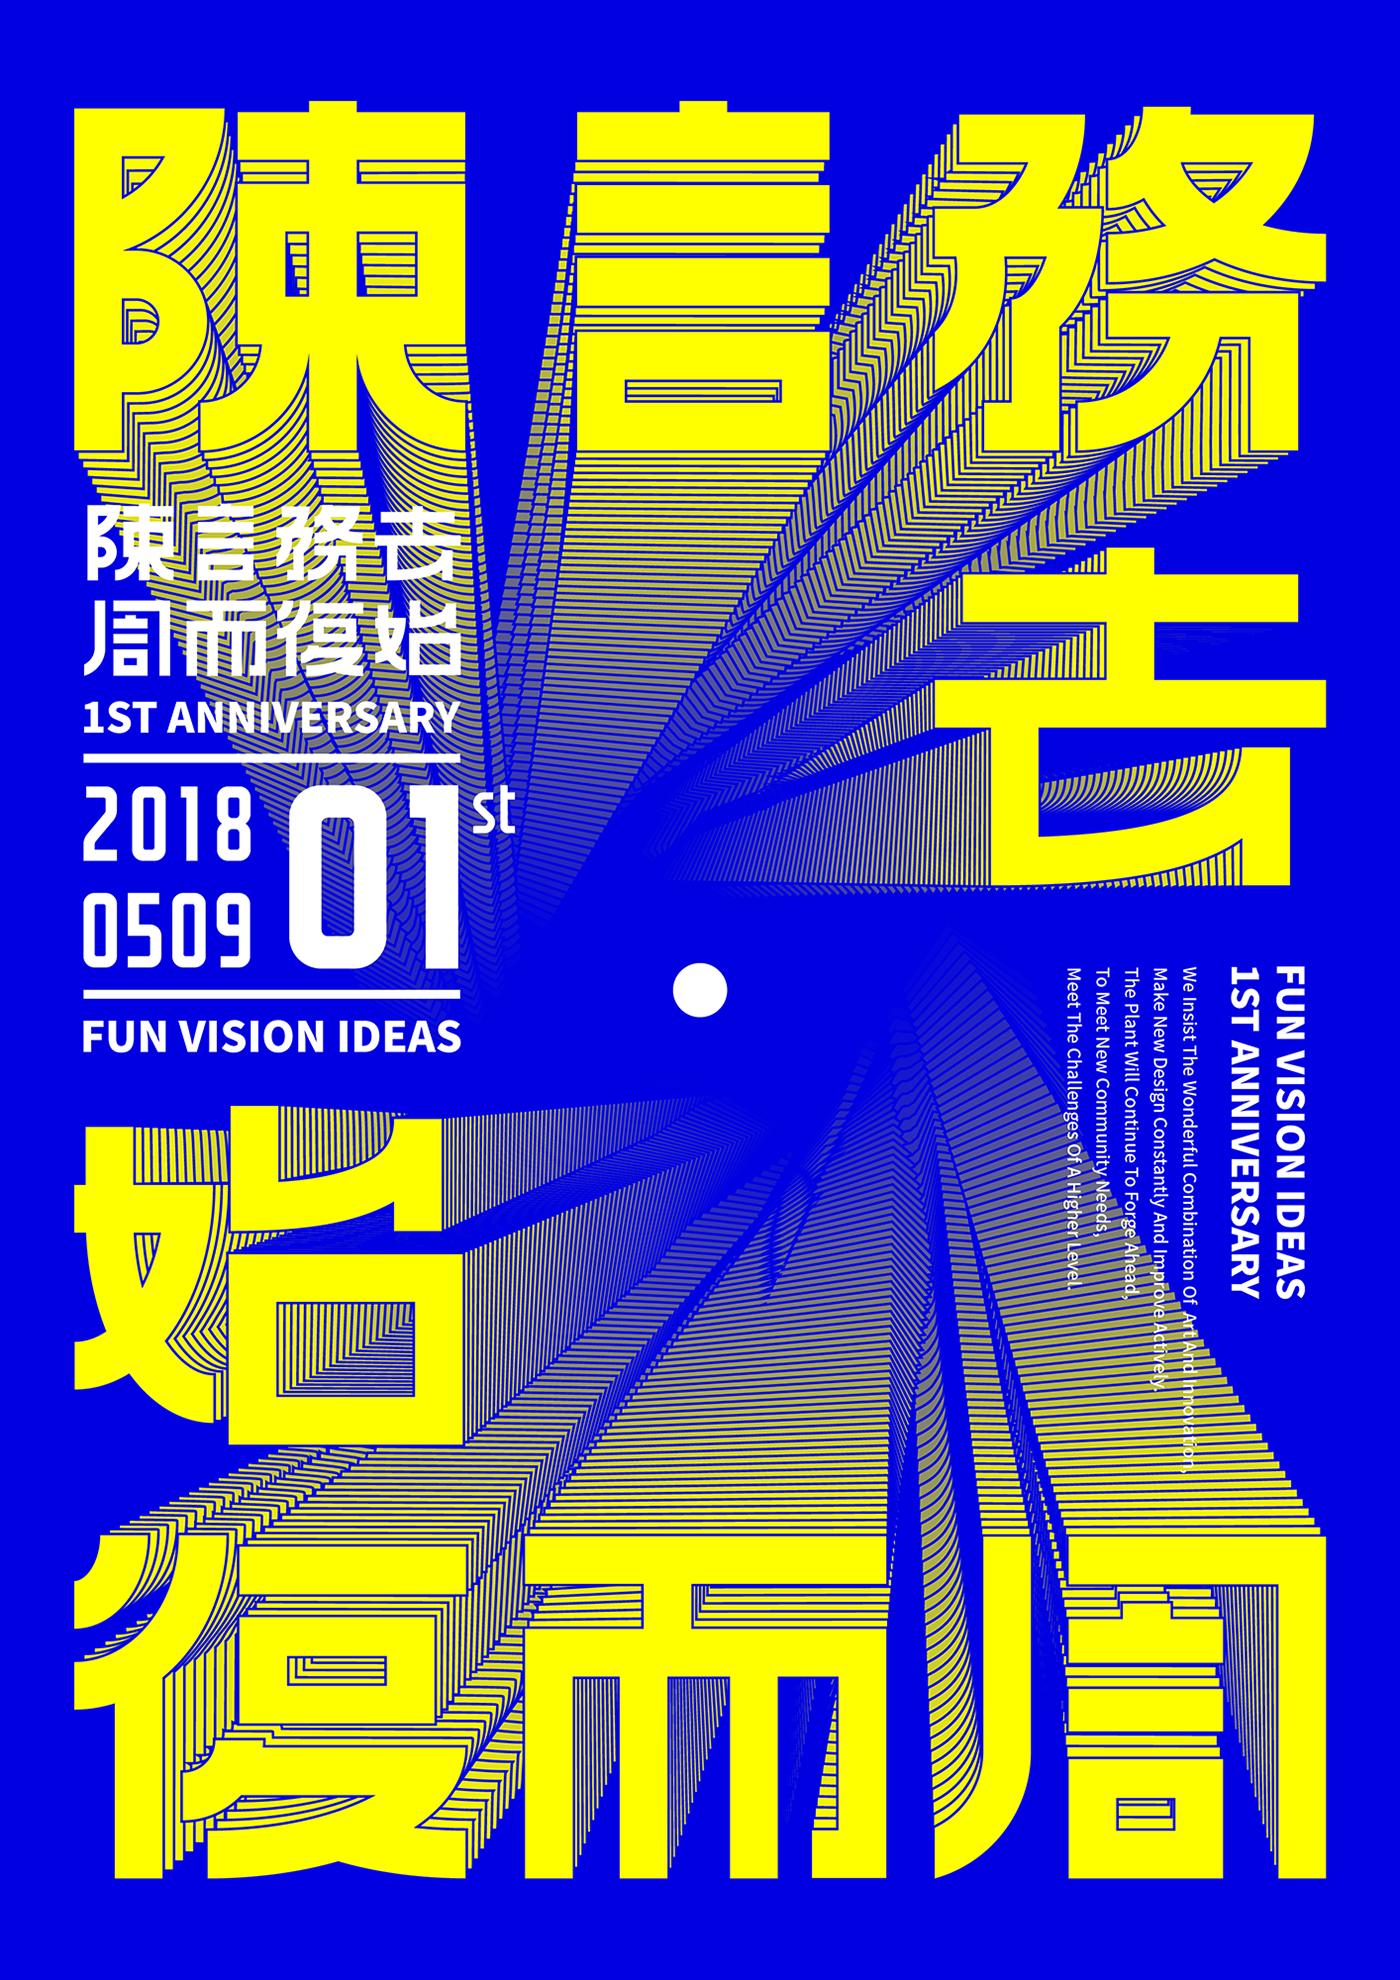 graphic design  Poster Design typeface design poster exhibition Activity posters 平面设计 海报设计 字体设计 活动海报 海报展